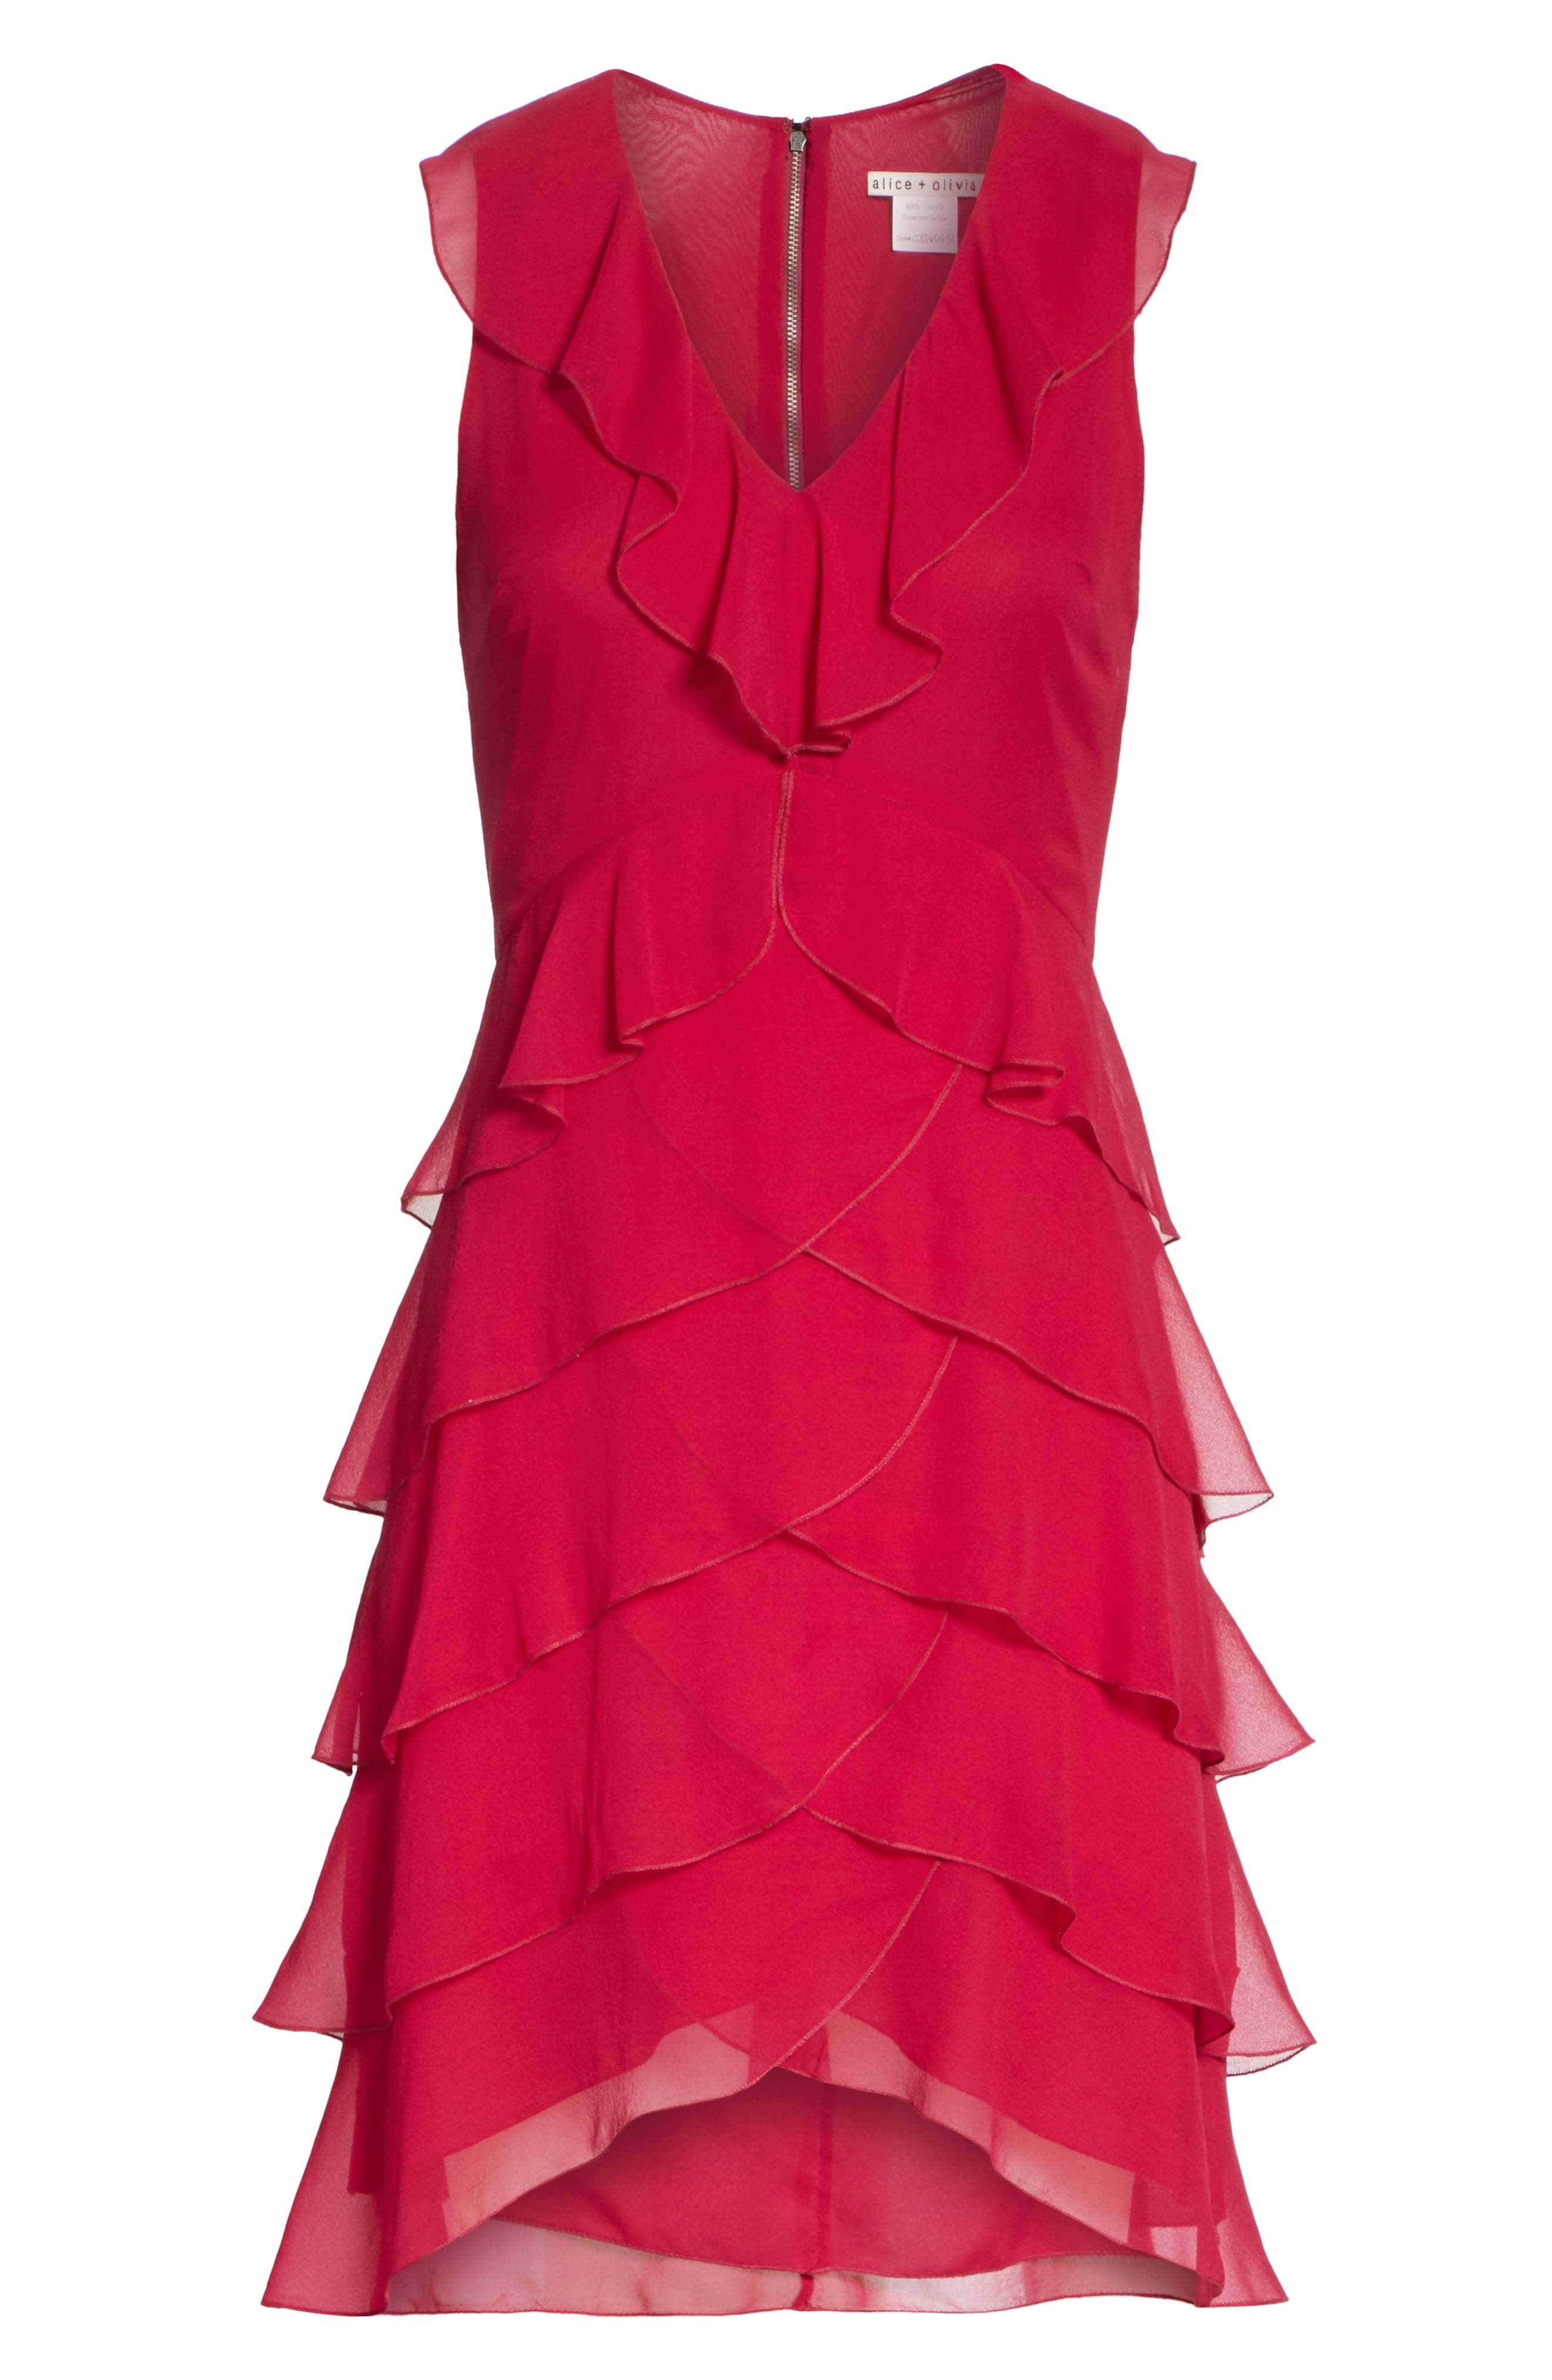 ALICE + OLIVIA,                             Felicita Ruffle Silk Dress,                             Alternate thumbnail 6, color,                             601